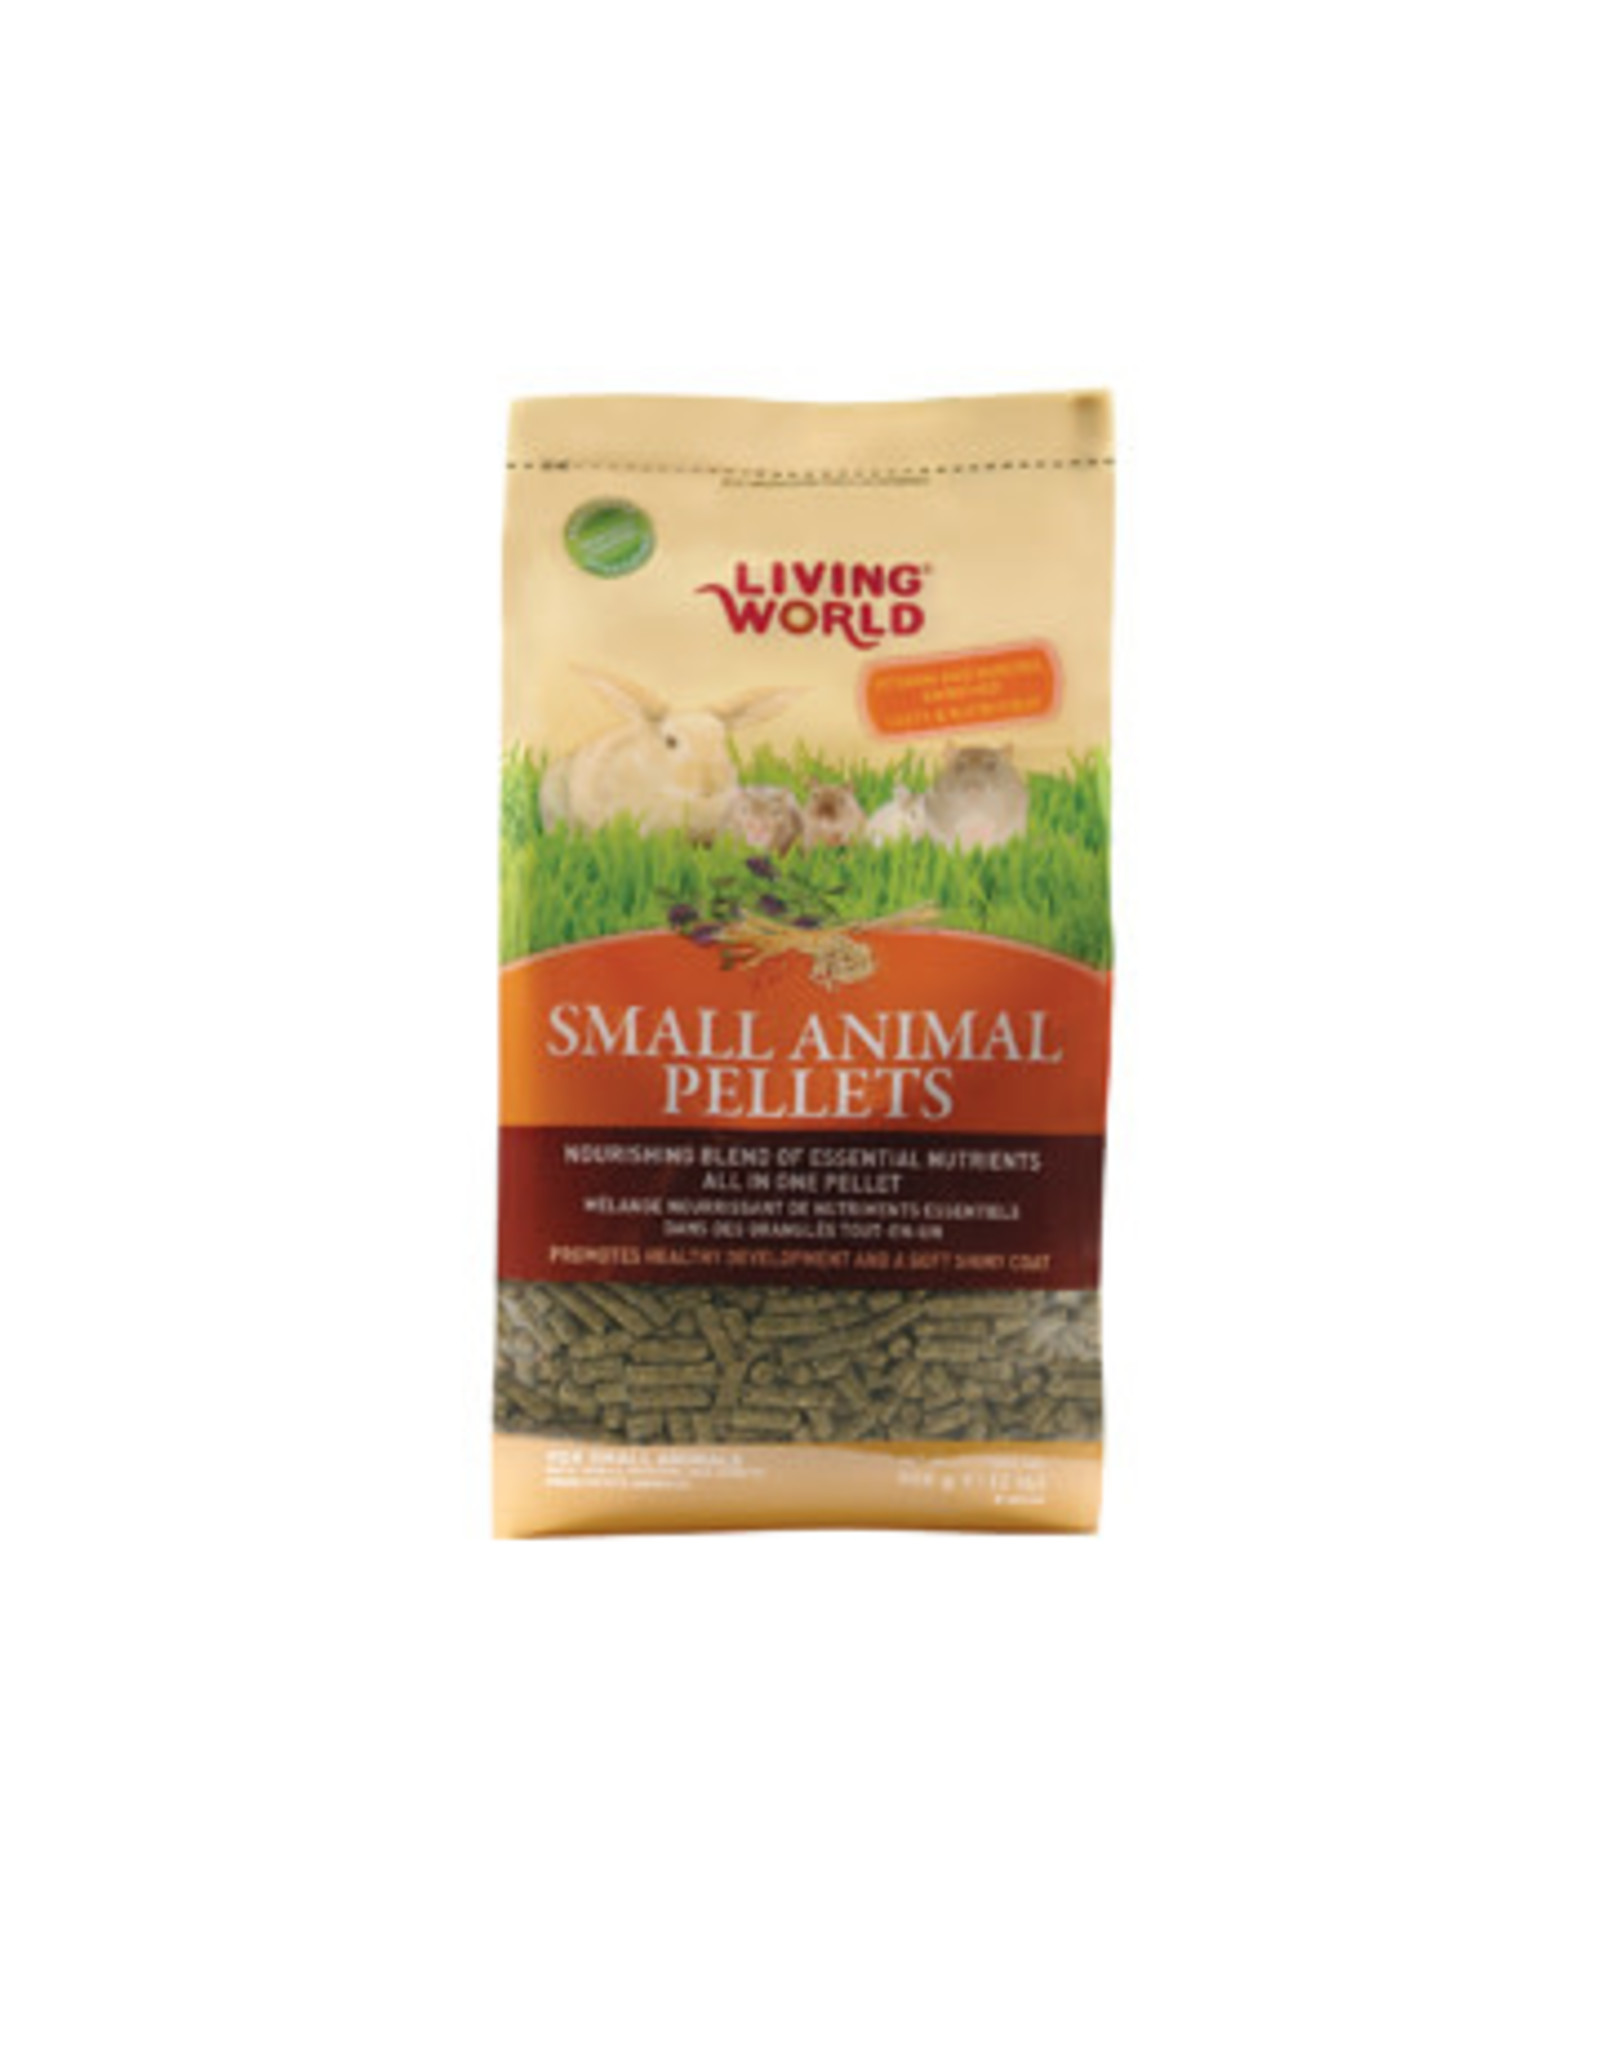 Living World Living World Small Animal Pellets - 900 g (2 lbs)